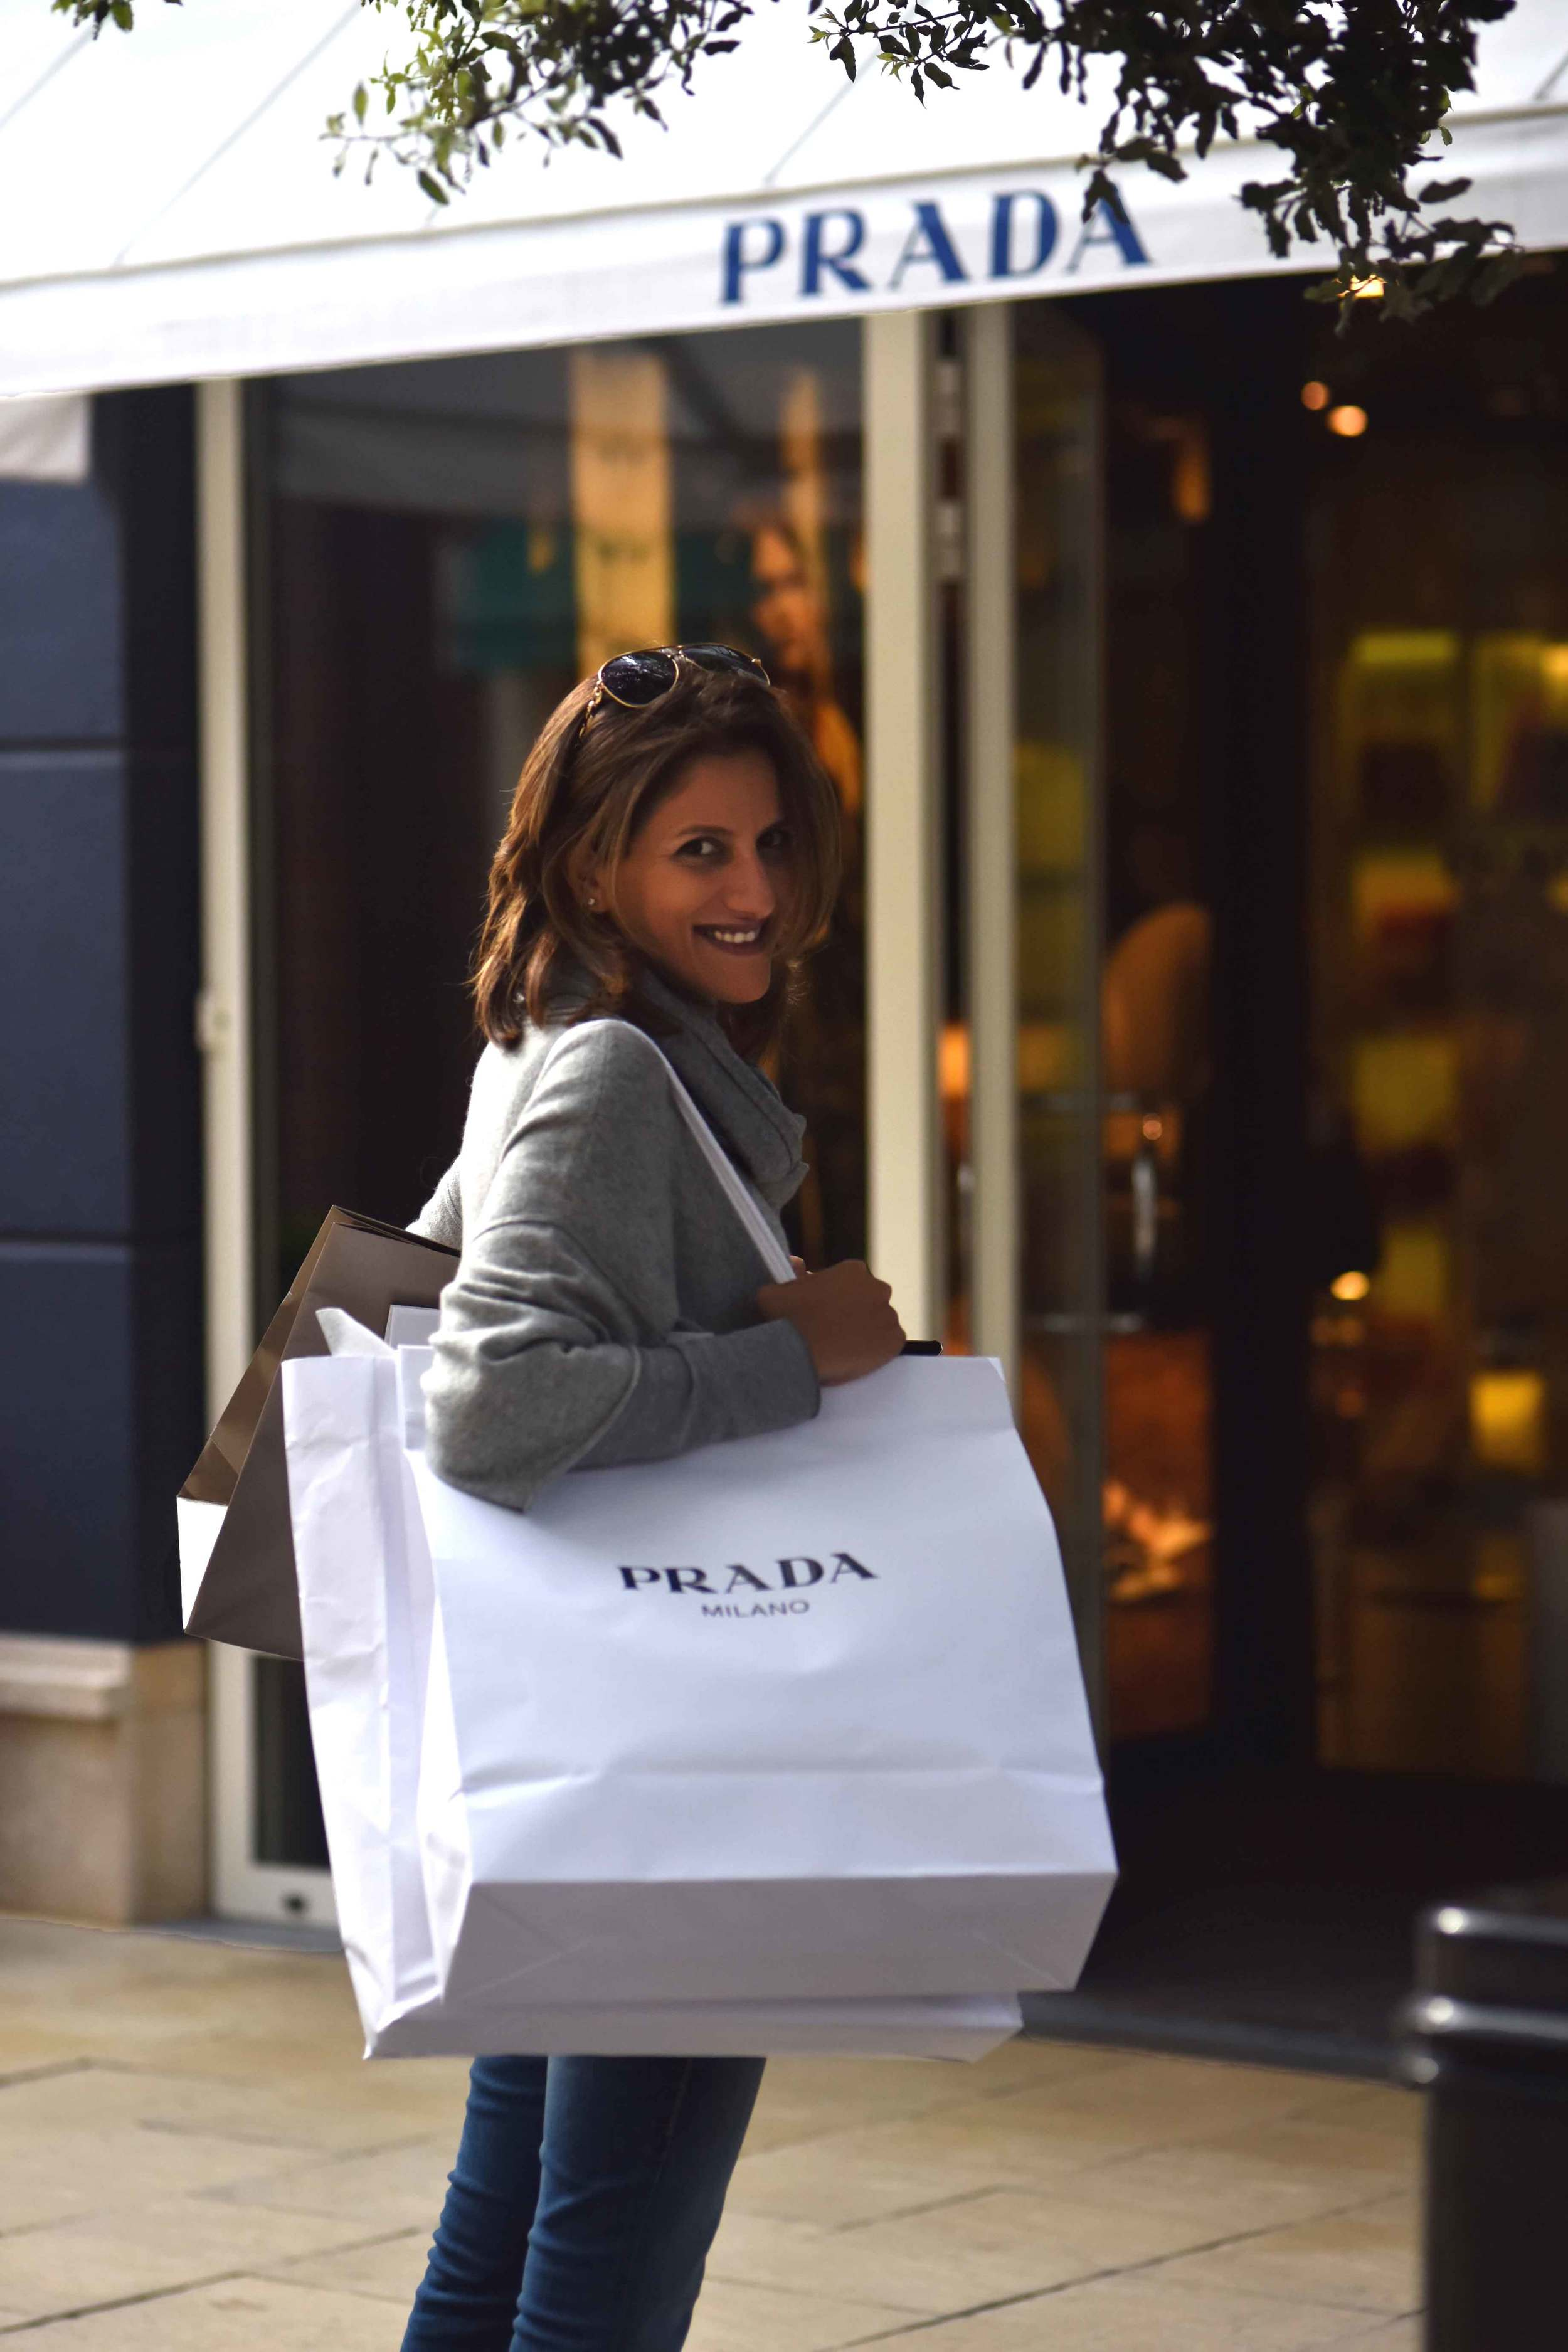 Prada shopping bag, Prada, Designer Outlet Roermond, Netherlands. Photo: Nicola Nolting, image©sourcingstyle.com